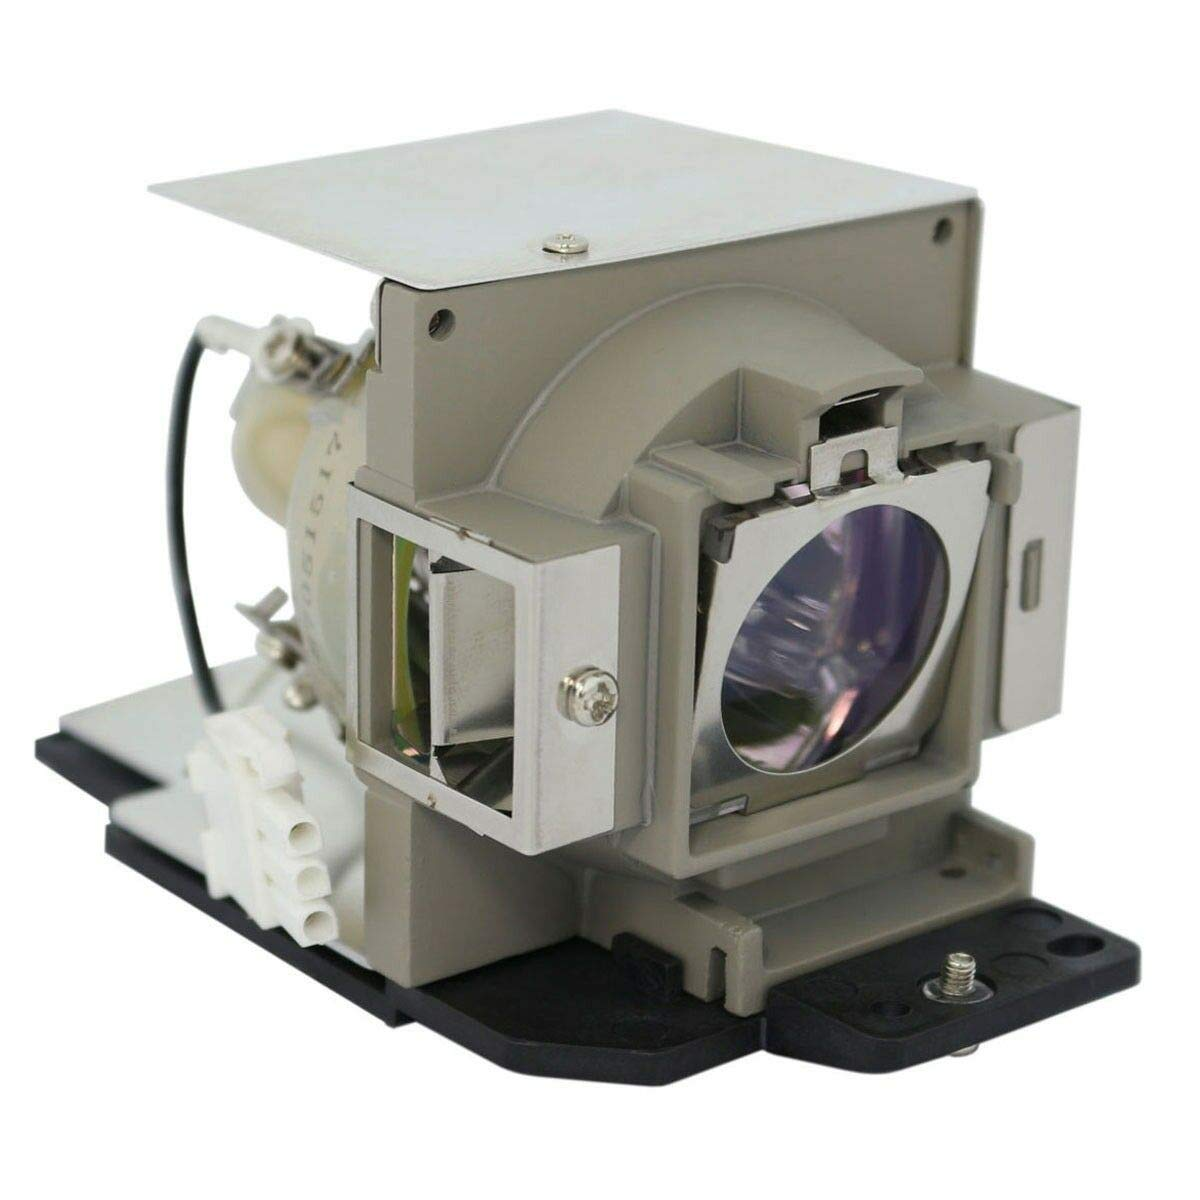 CTLAMP 5J.J4N05.001 ハウジング付き交換用ランプ BENQ MX717 / MX763 / MX764に対応   B07Q3D49VL